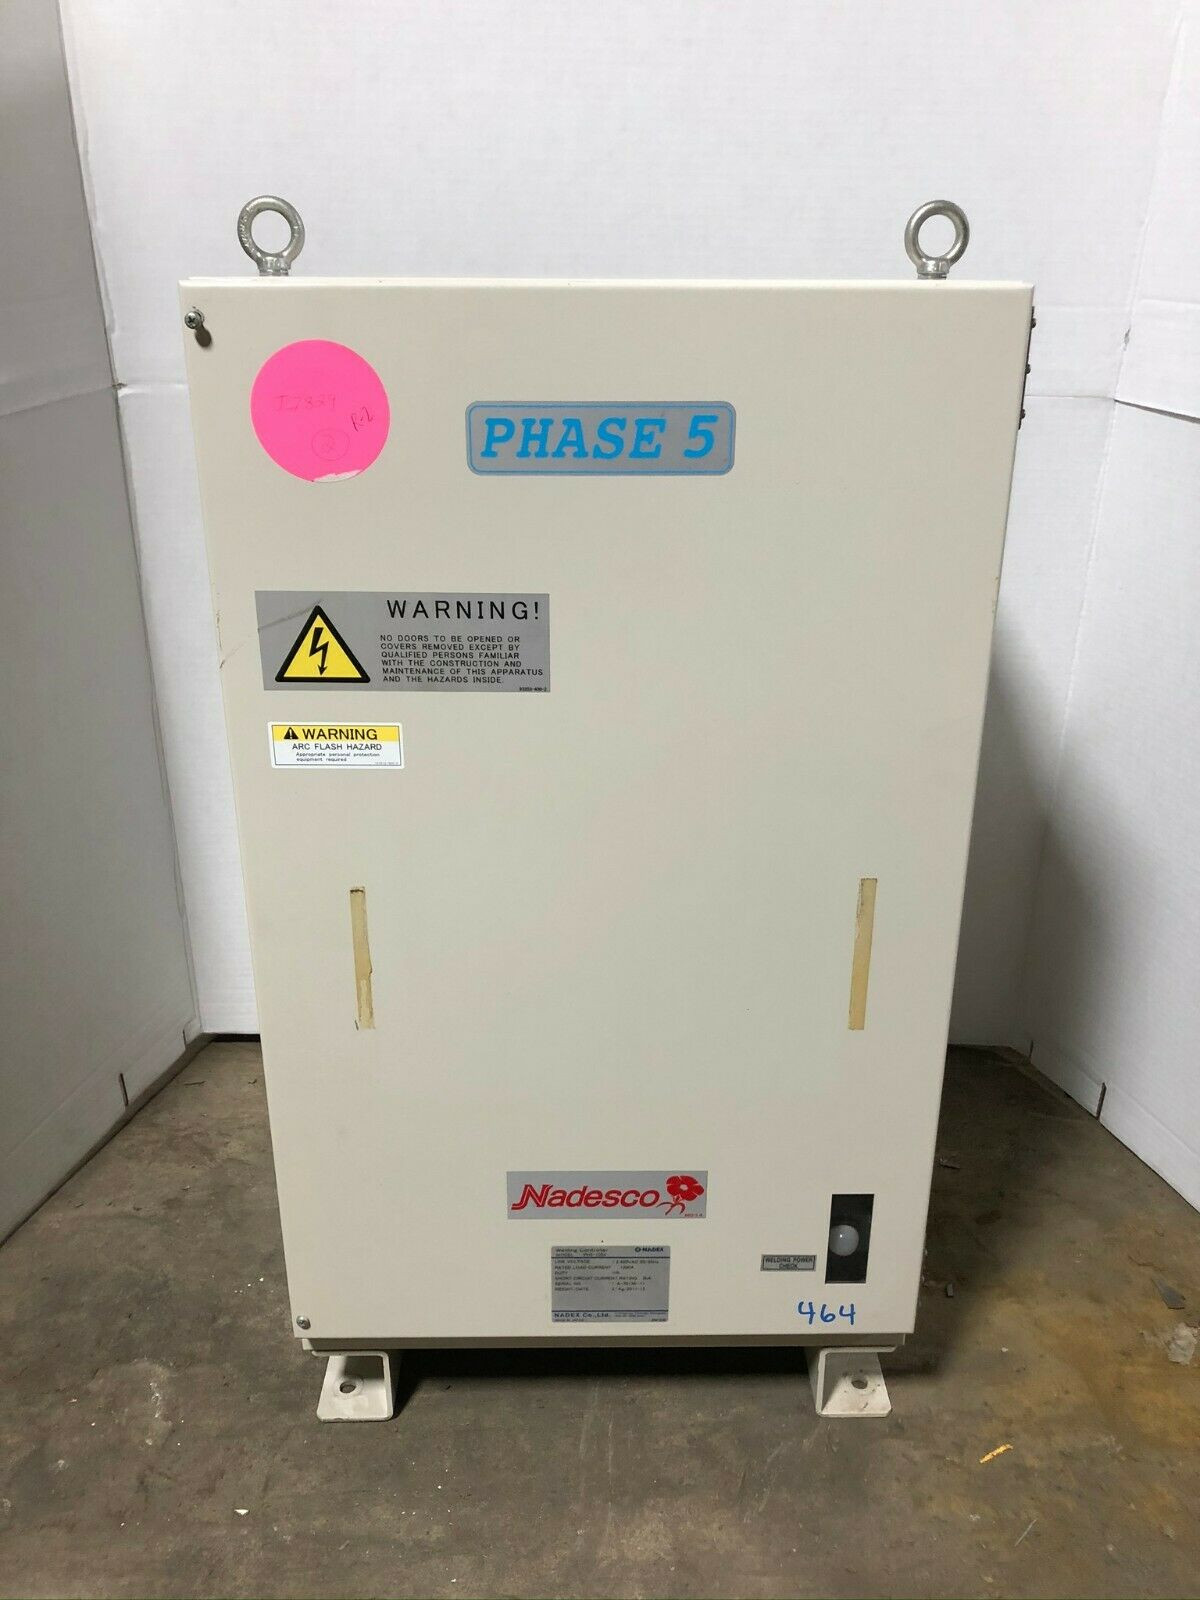 Nadesco Nadex PH5-1094 Welding Controller 480VAC 1200A 5kA